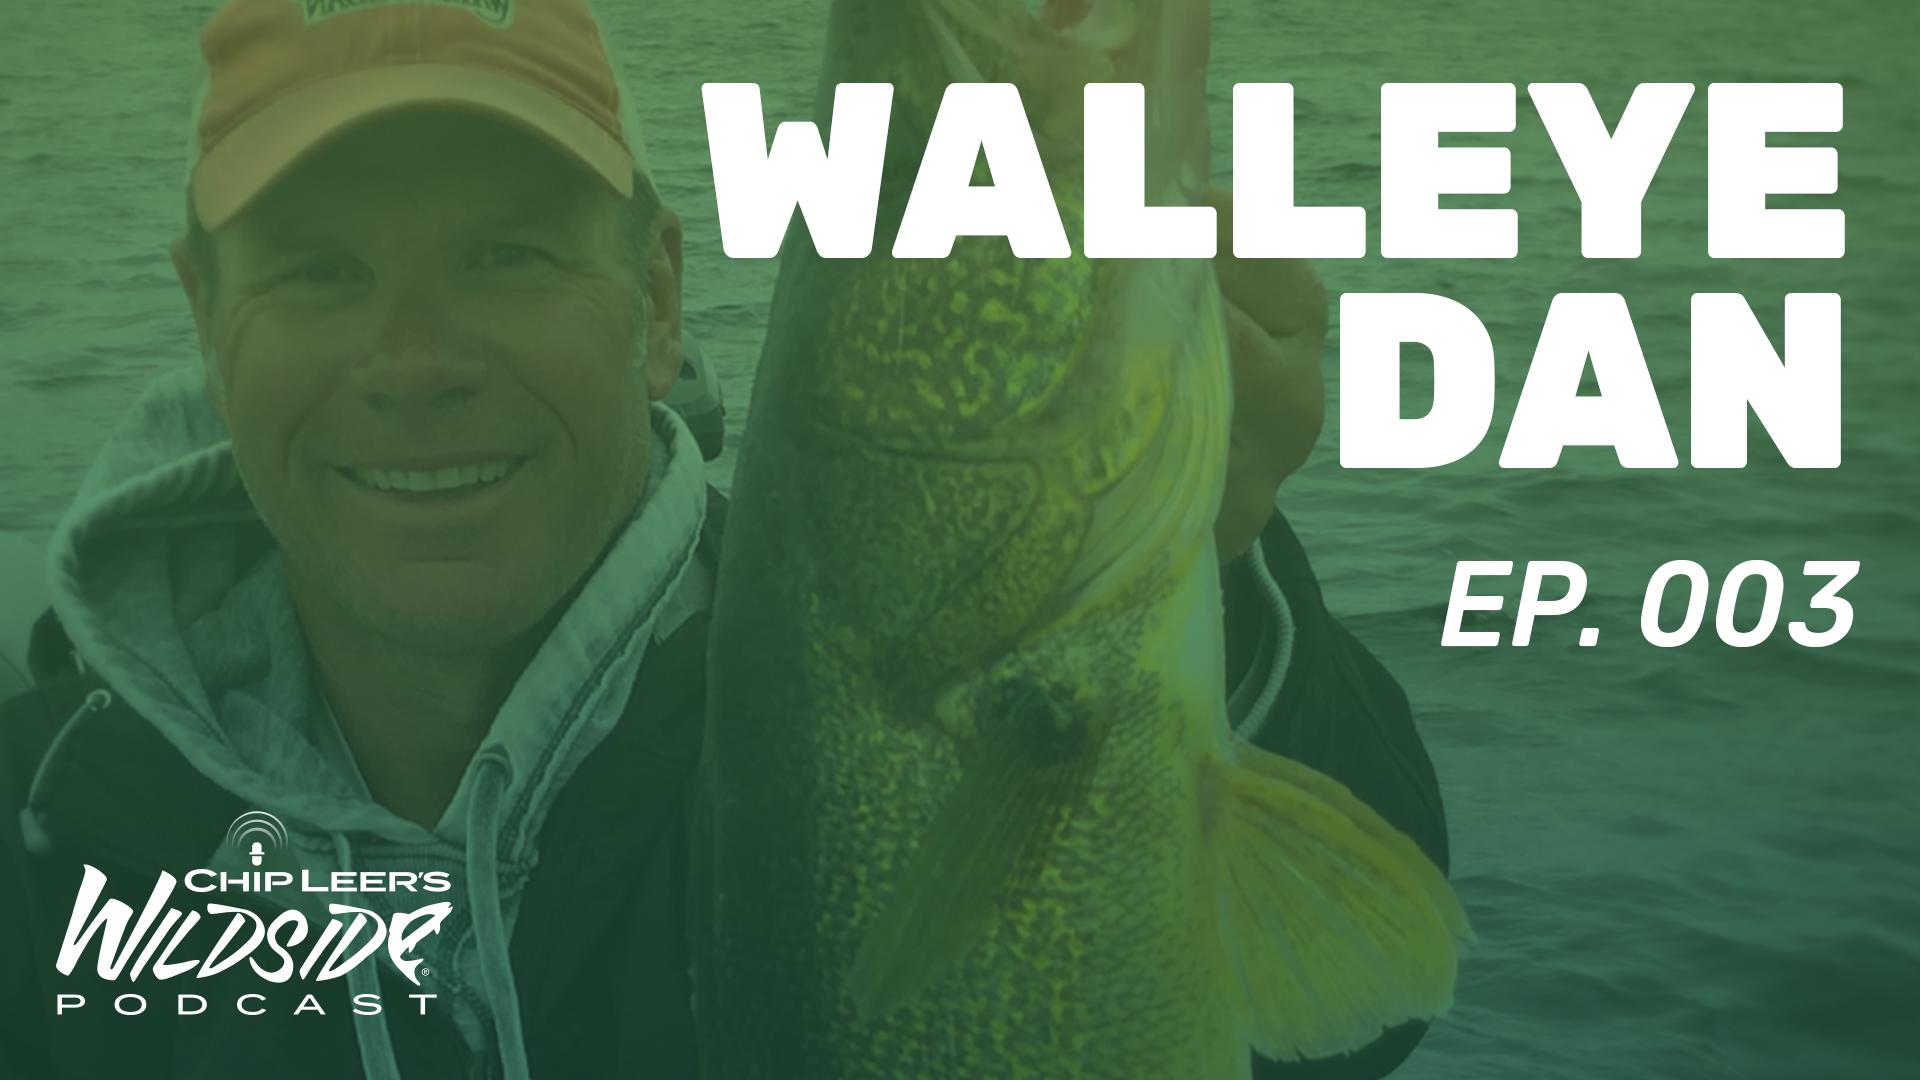 walleye Dan episode 3 podcast cover